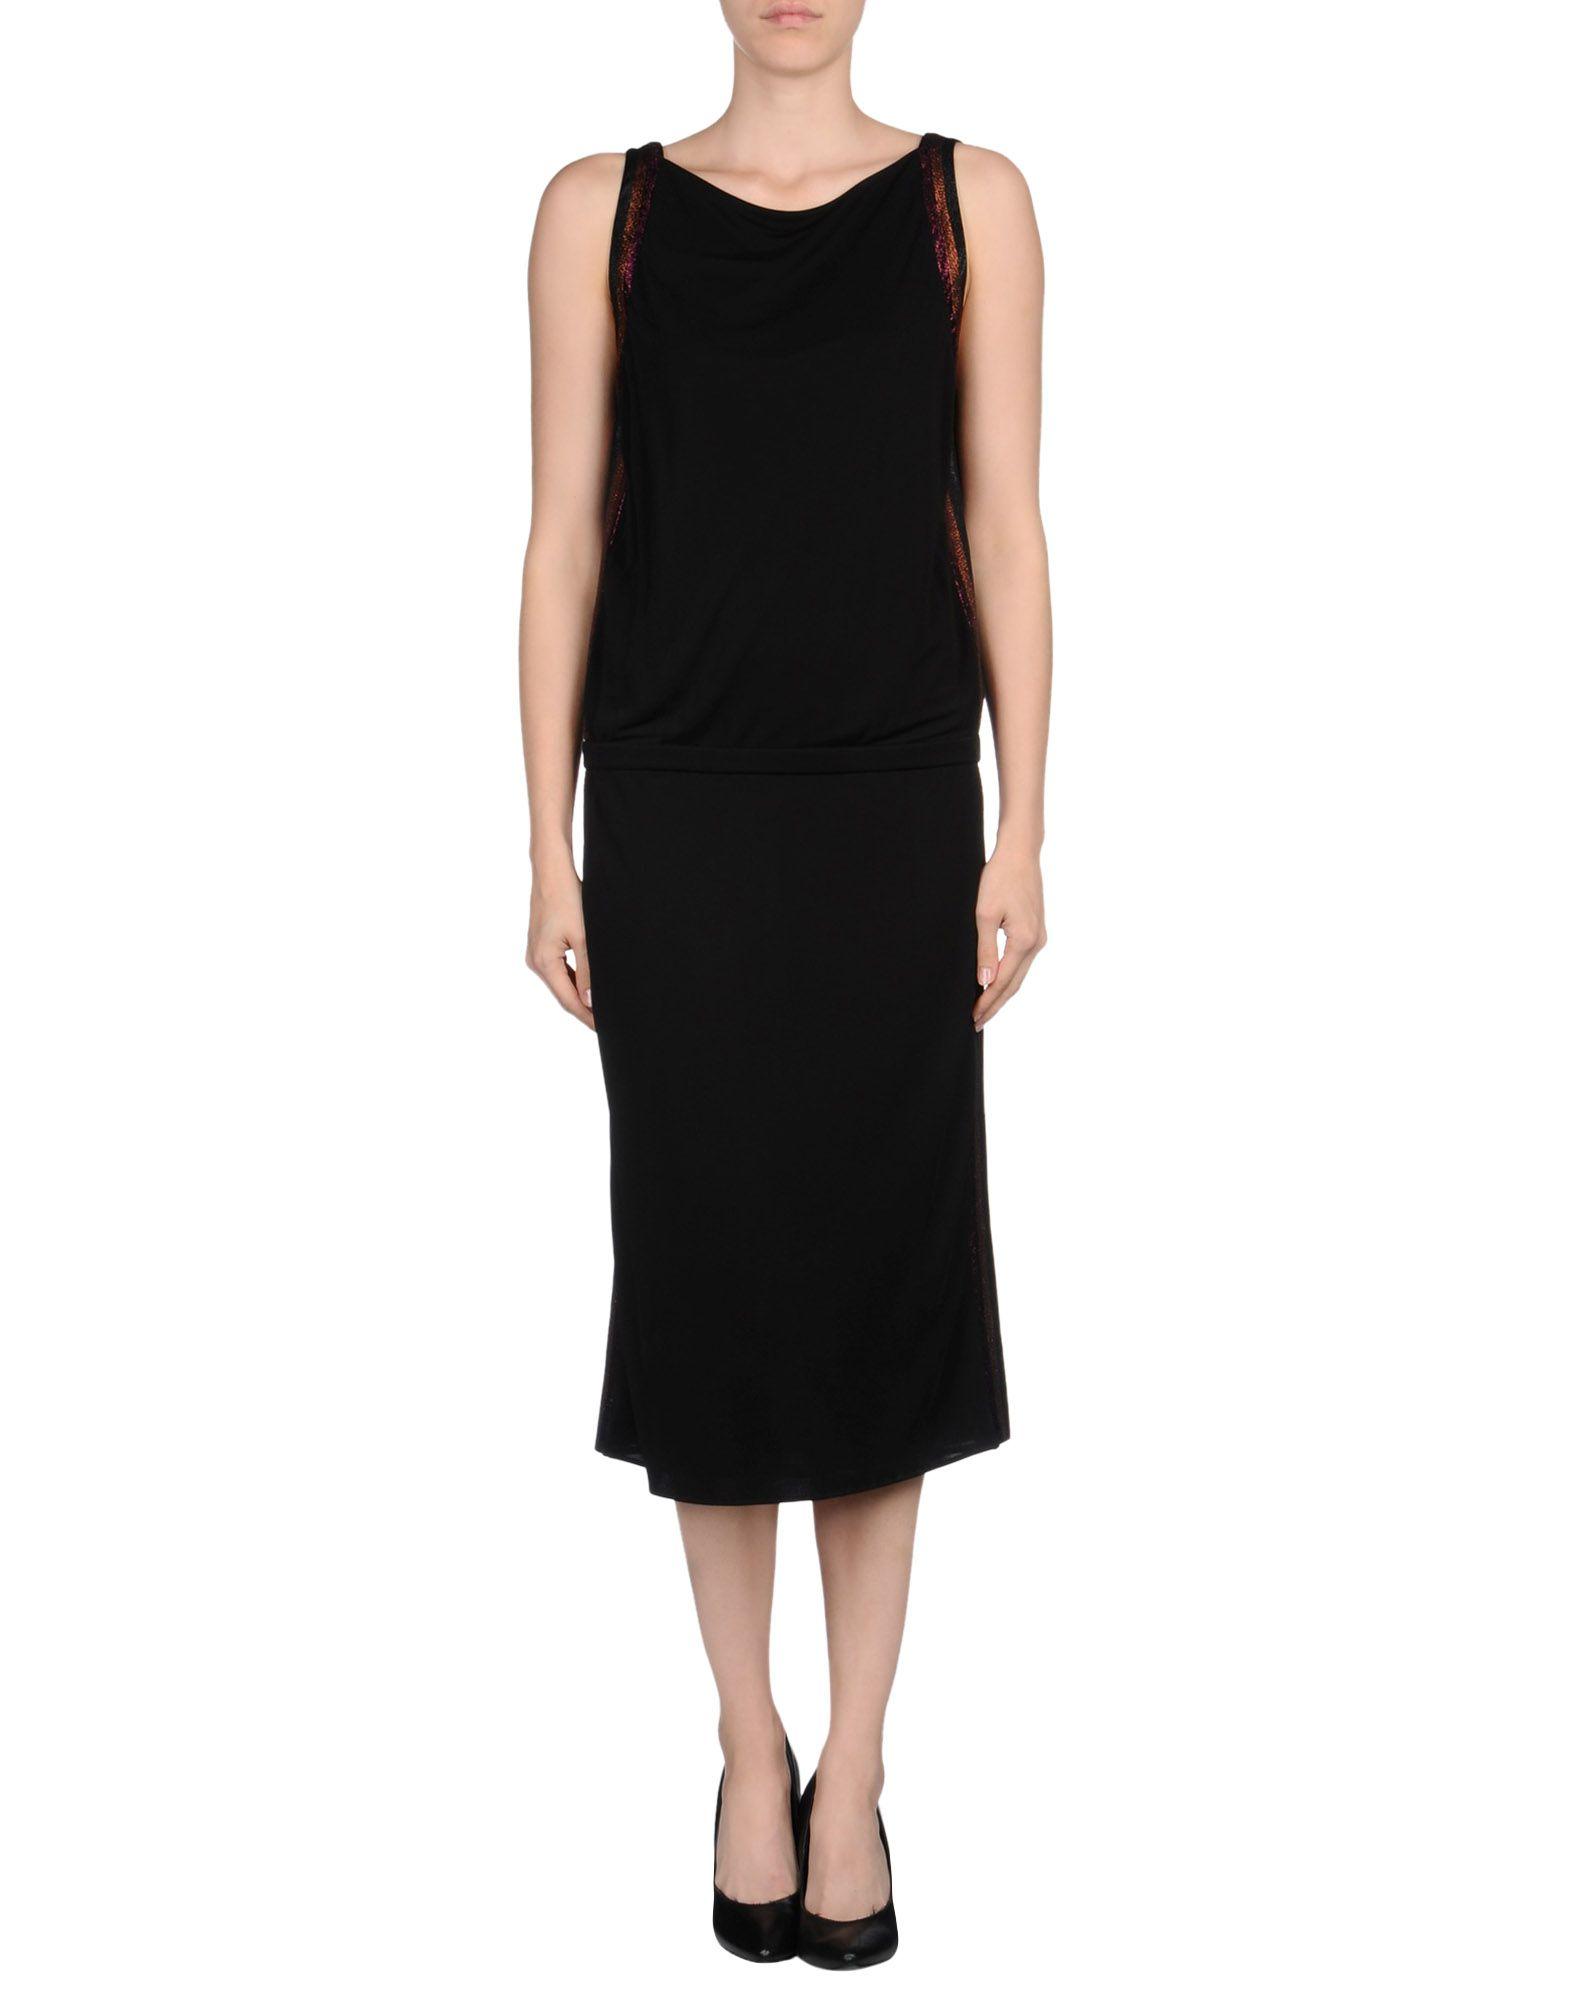 lyst gucci short dress in black